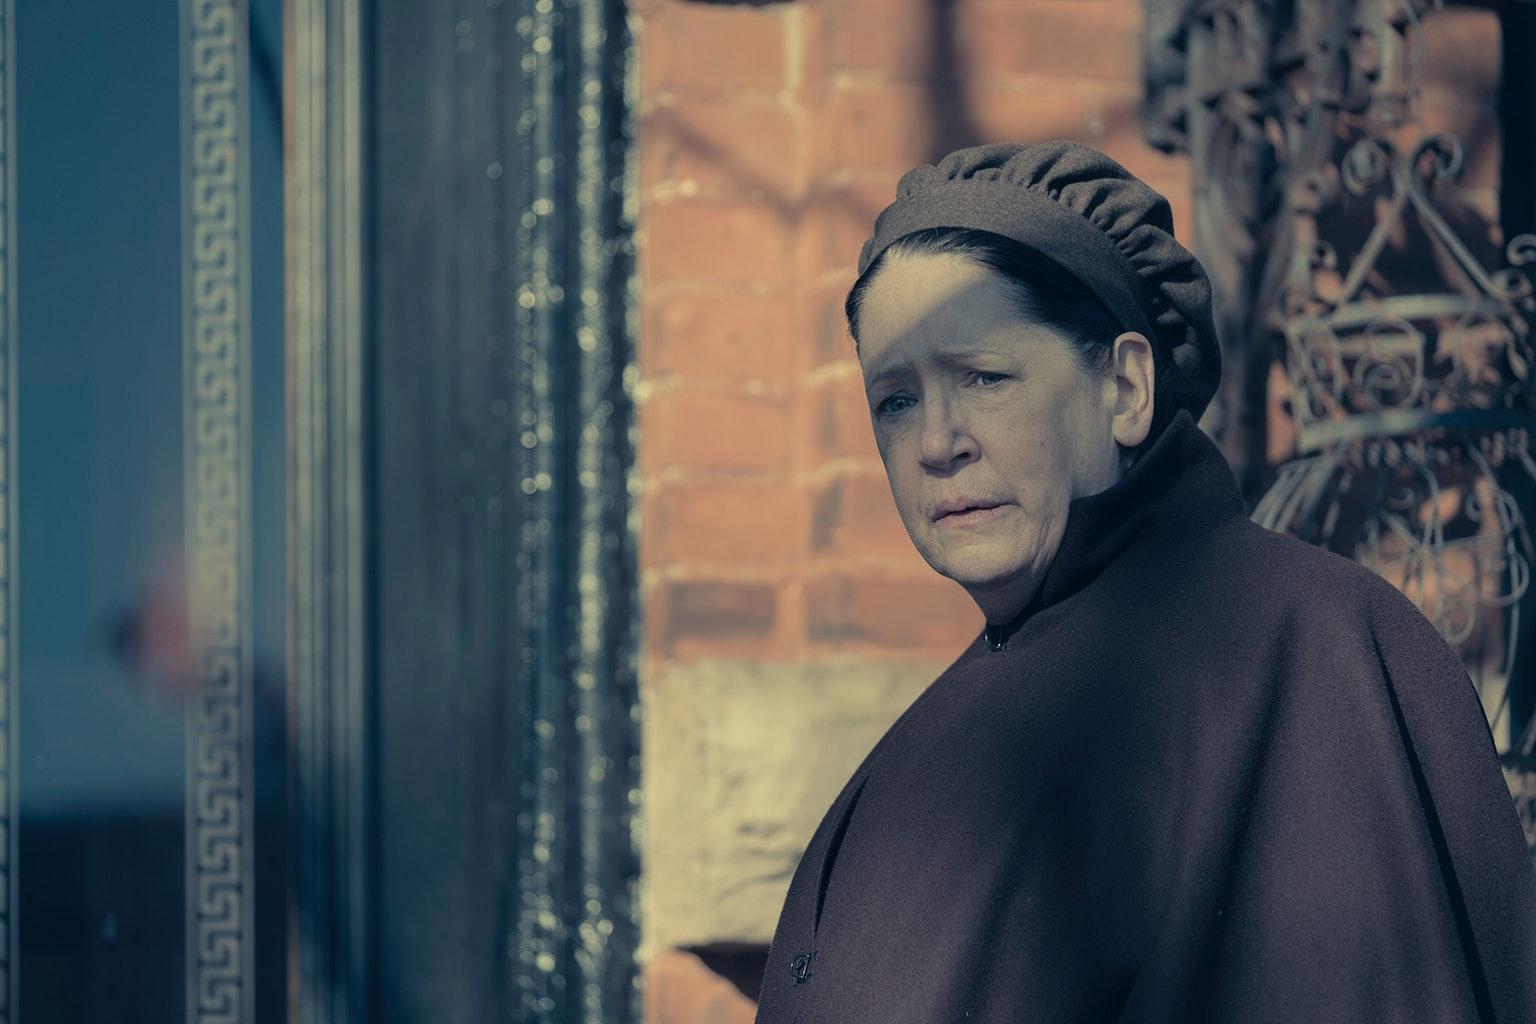 Aunt Lydia The Handmaid's Tale Season 3